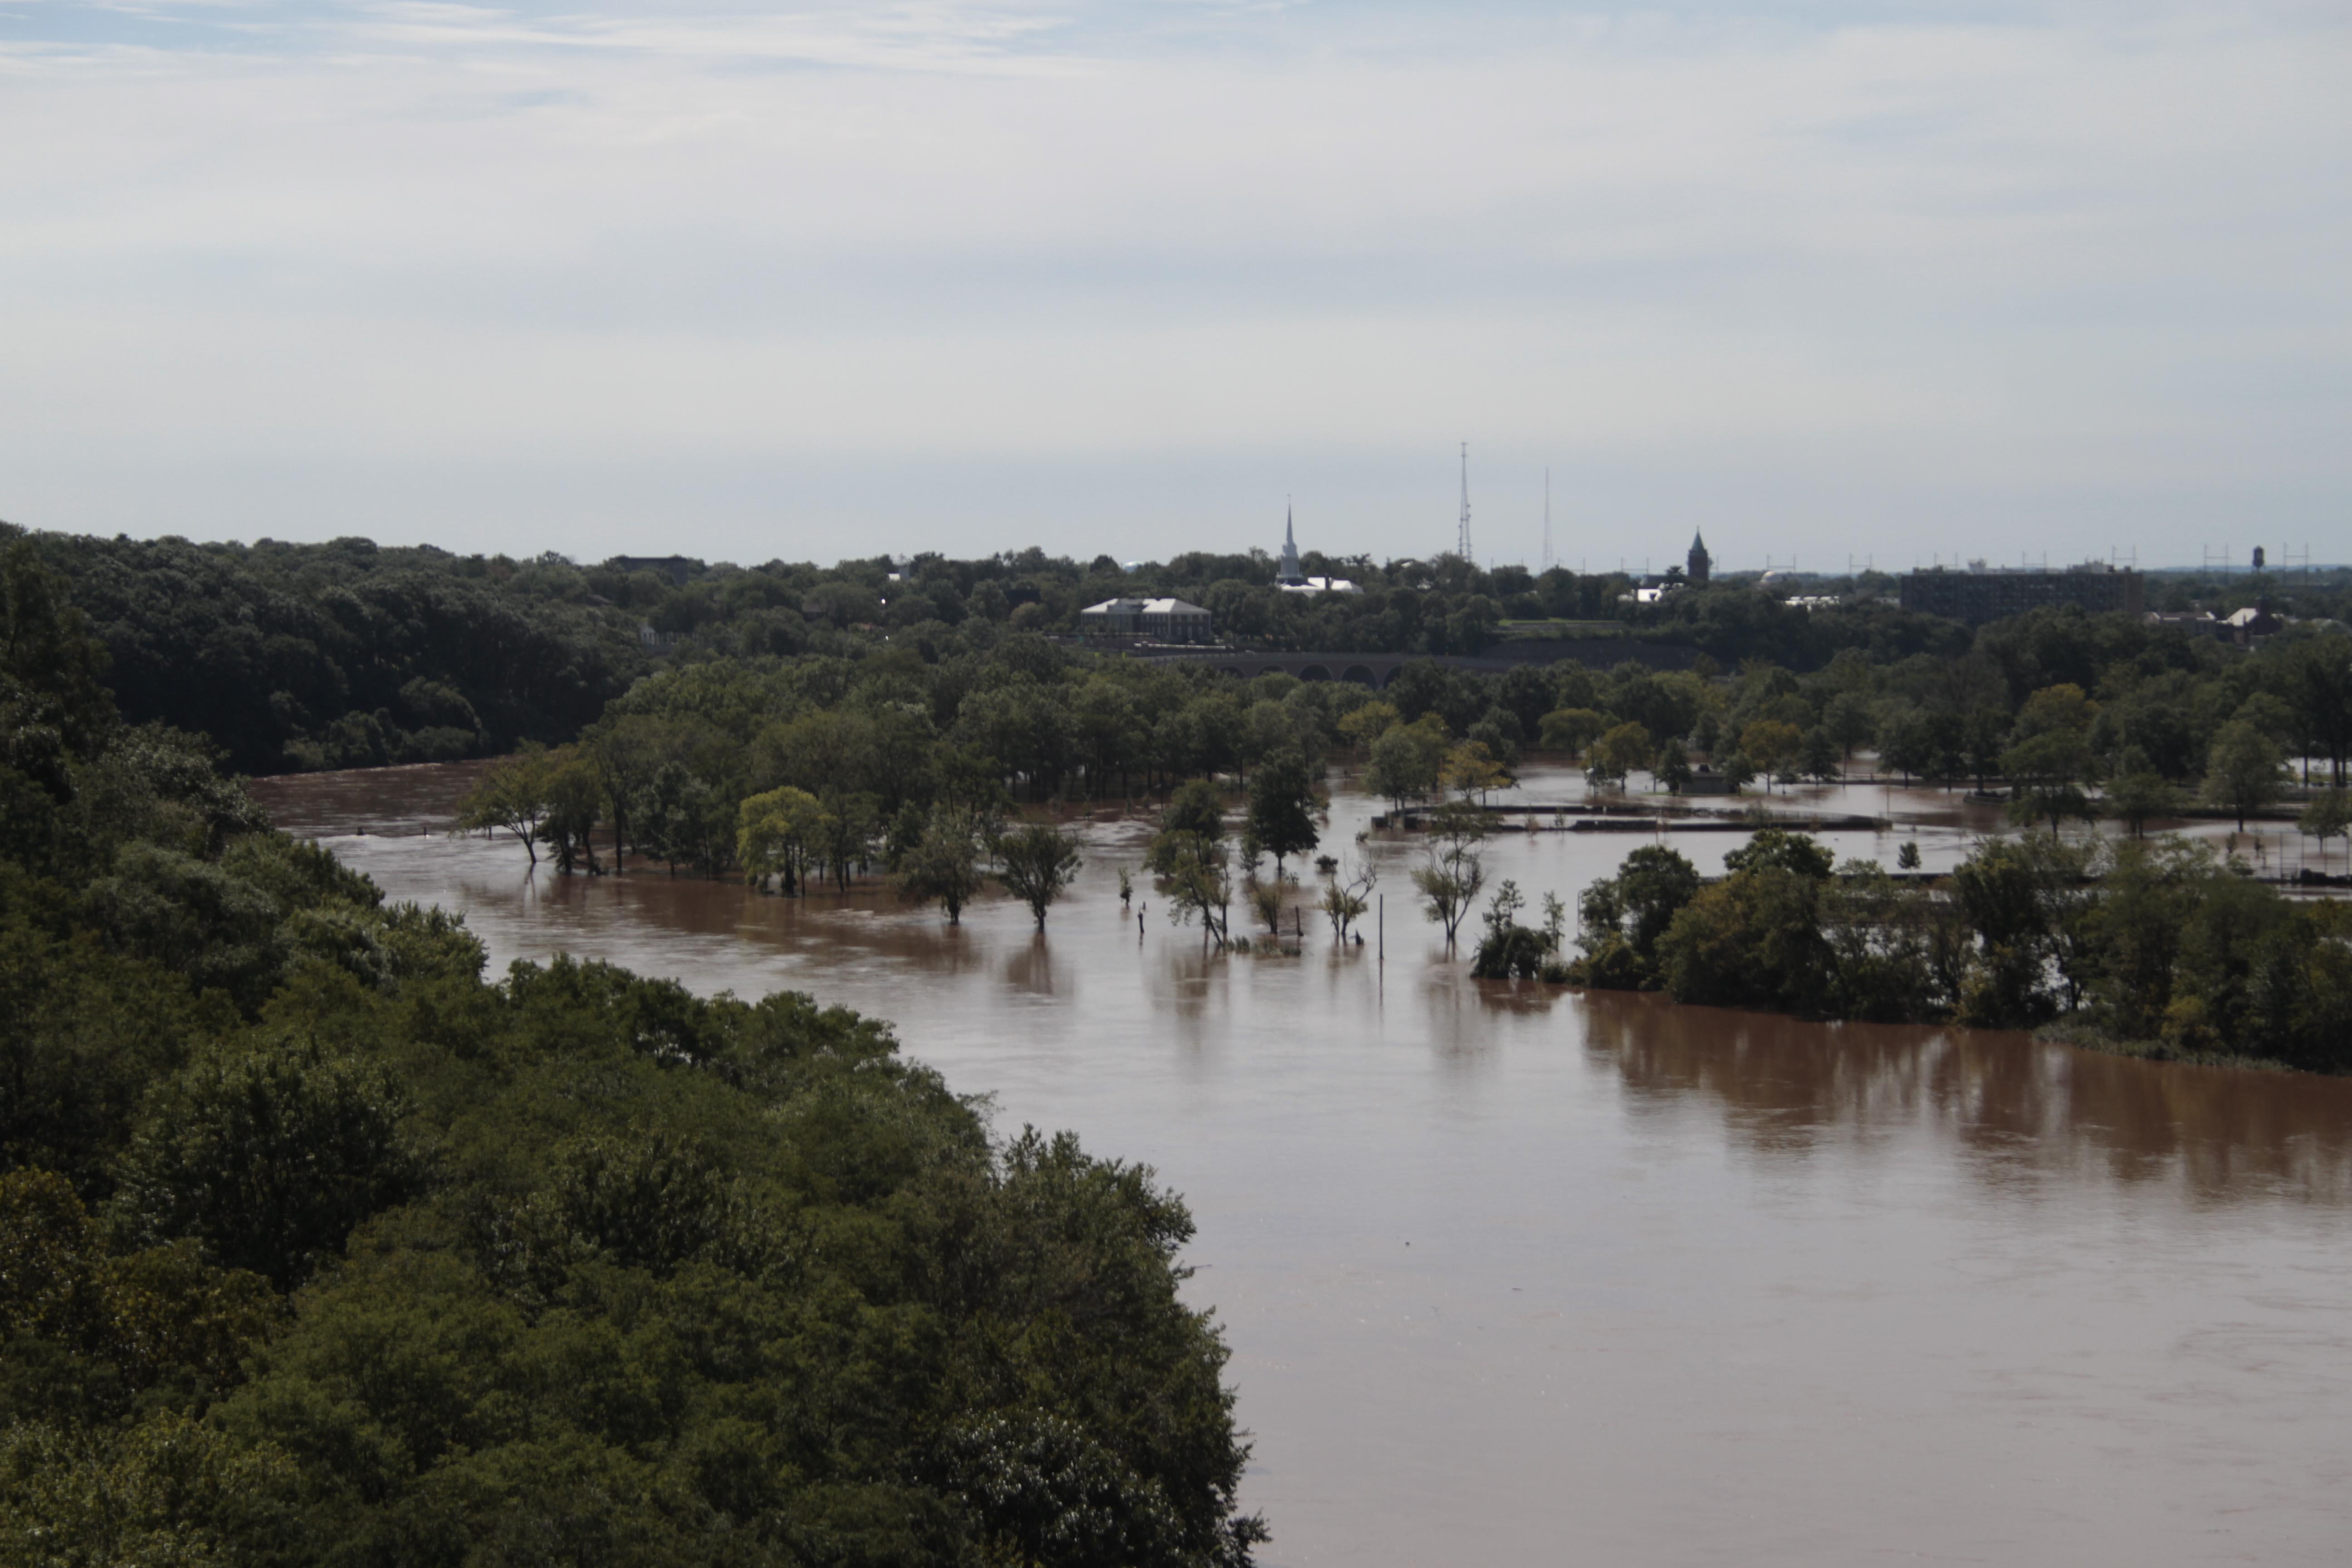 File:Raritan River Flood, New Brunswick, NJ JPG - Wikimedia